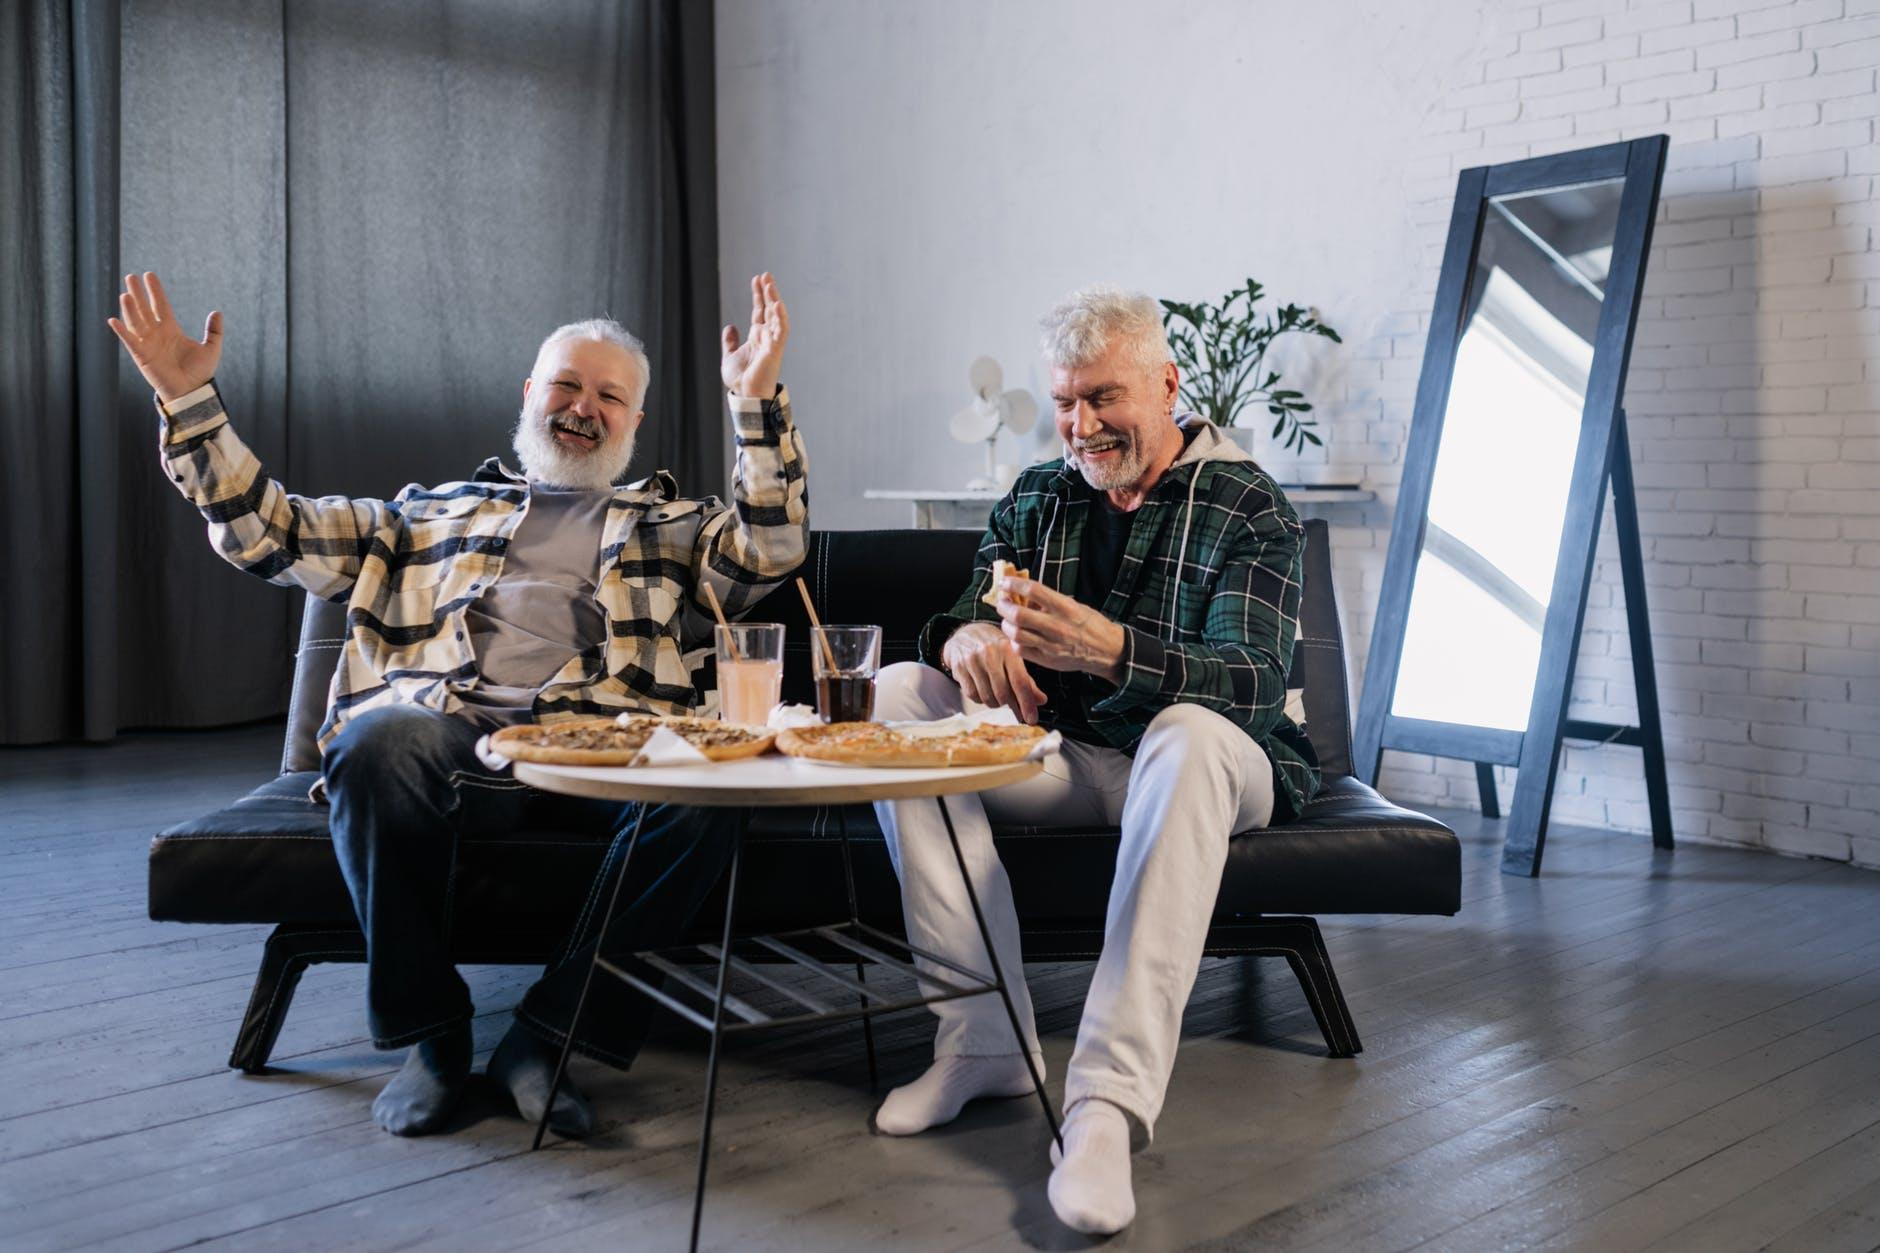 elderly men having fun